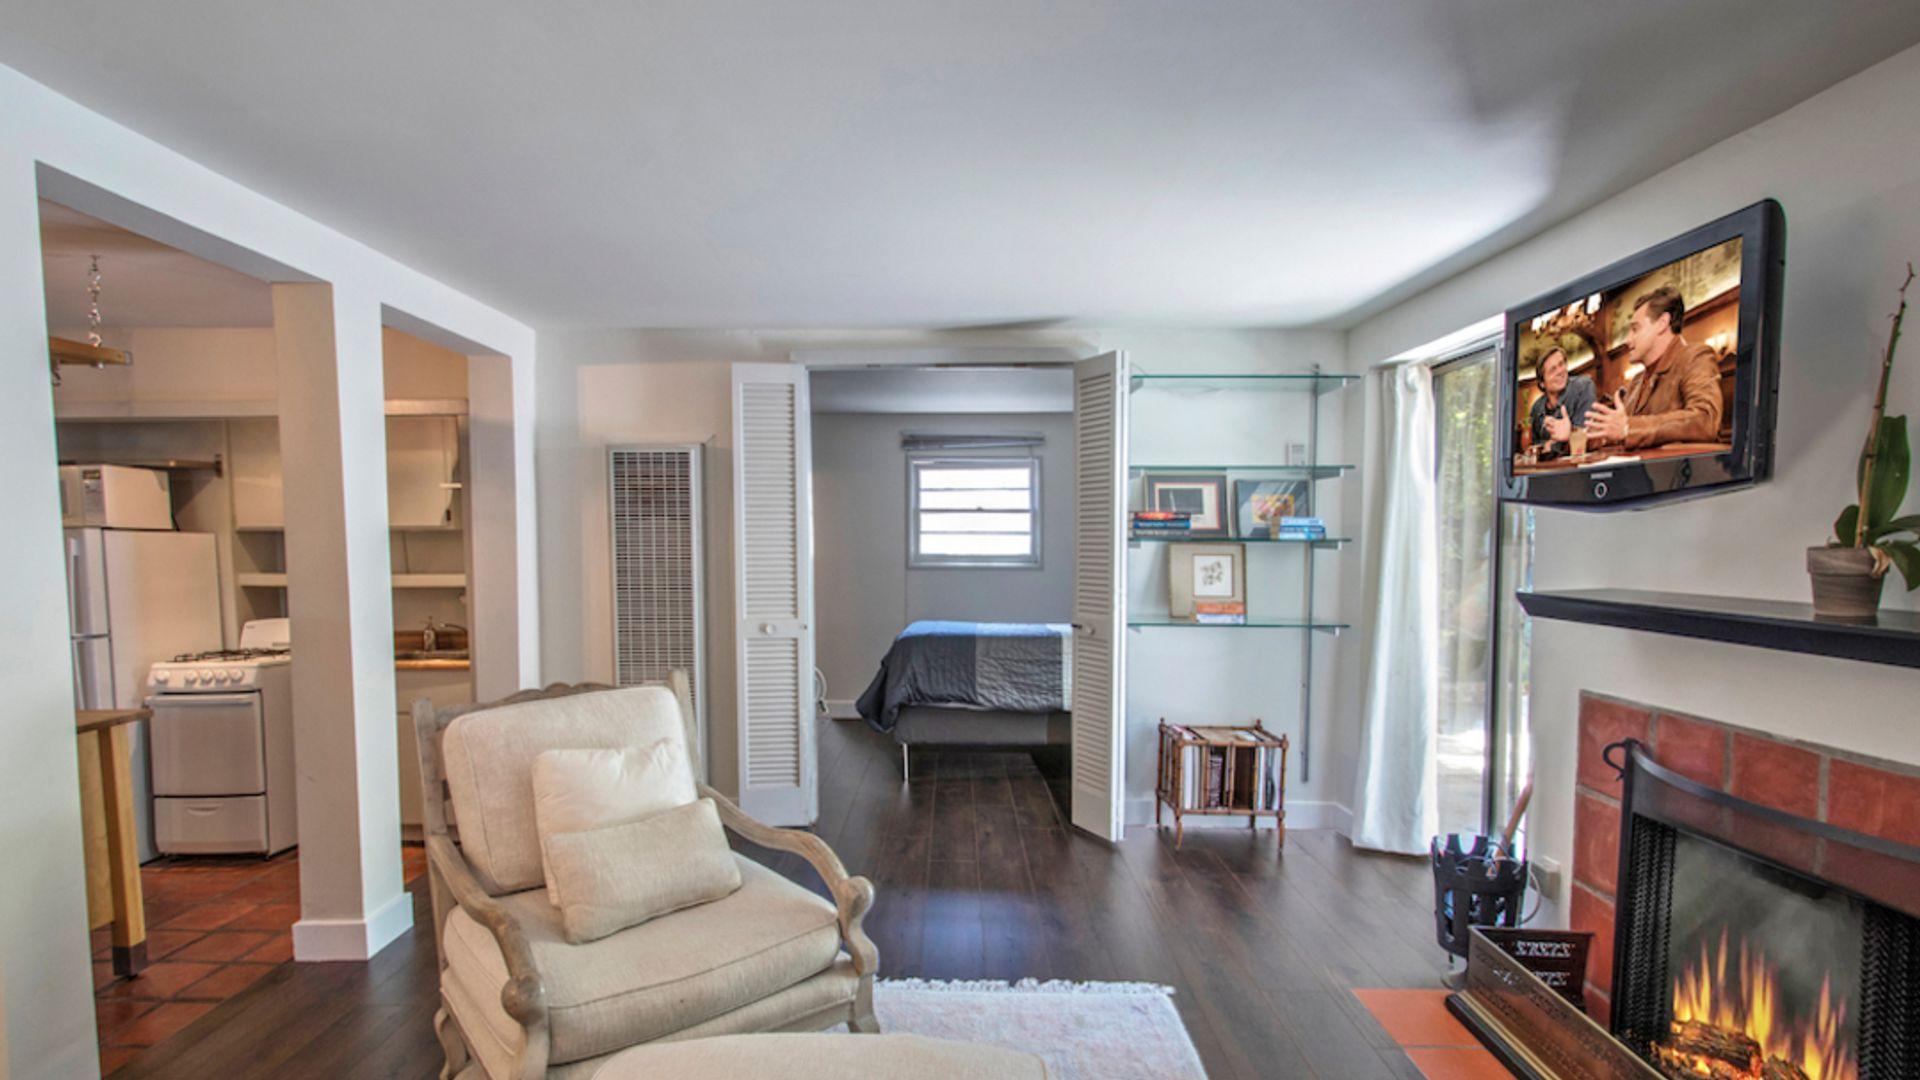 1 bed apartment at Ashcroft Ave, Los Angeles, CA, USA ...